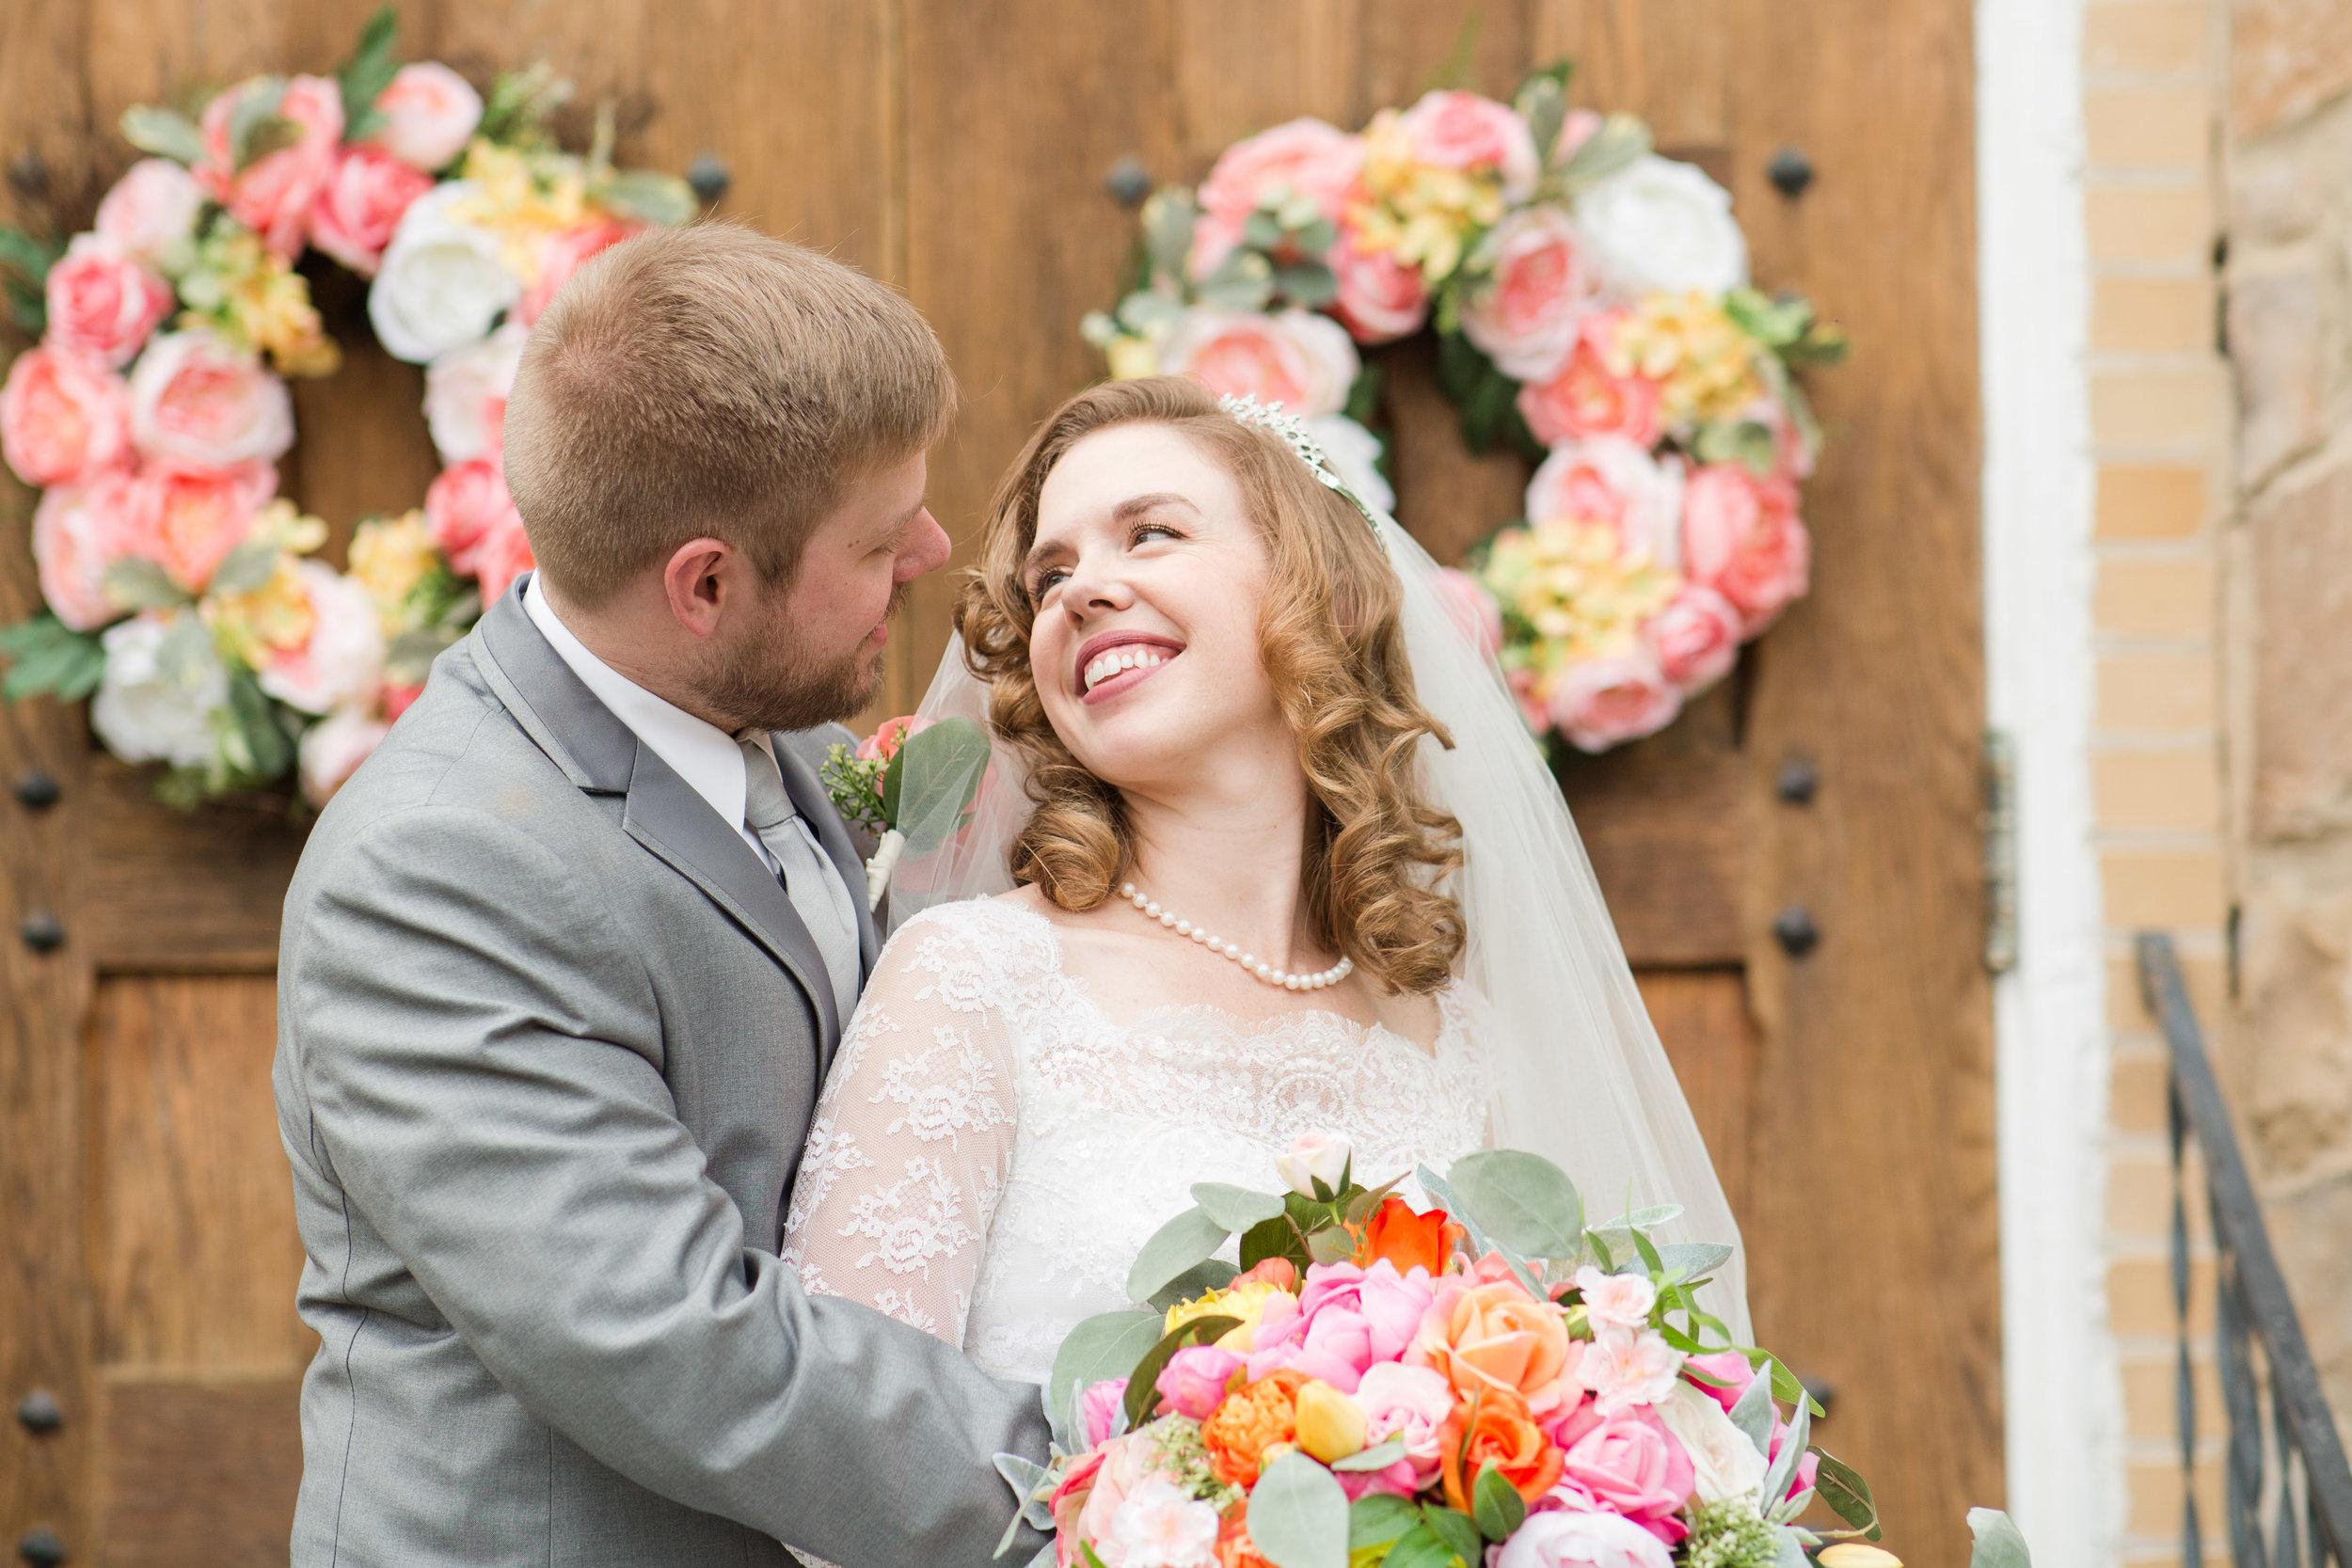 Wardensville, WV wedding, groom portrait-48.jpg